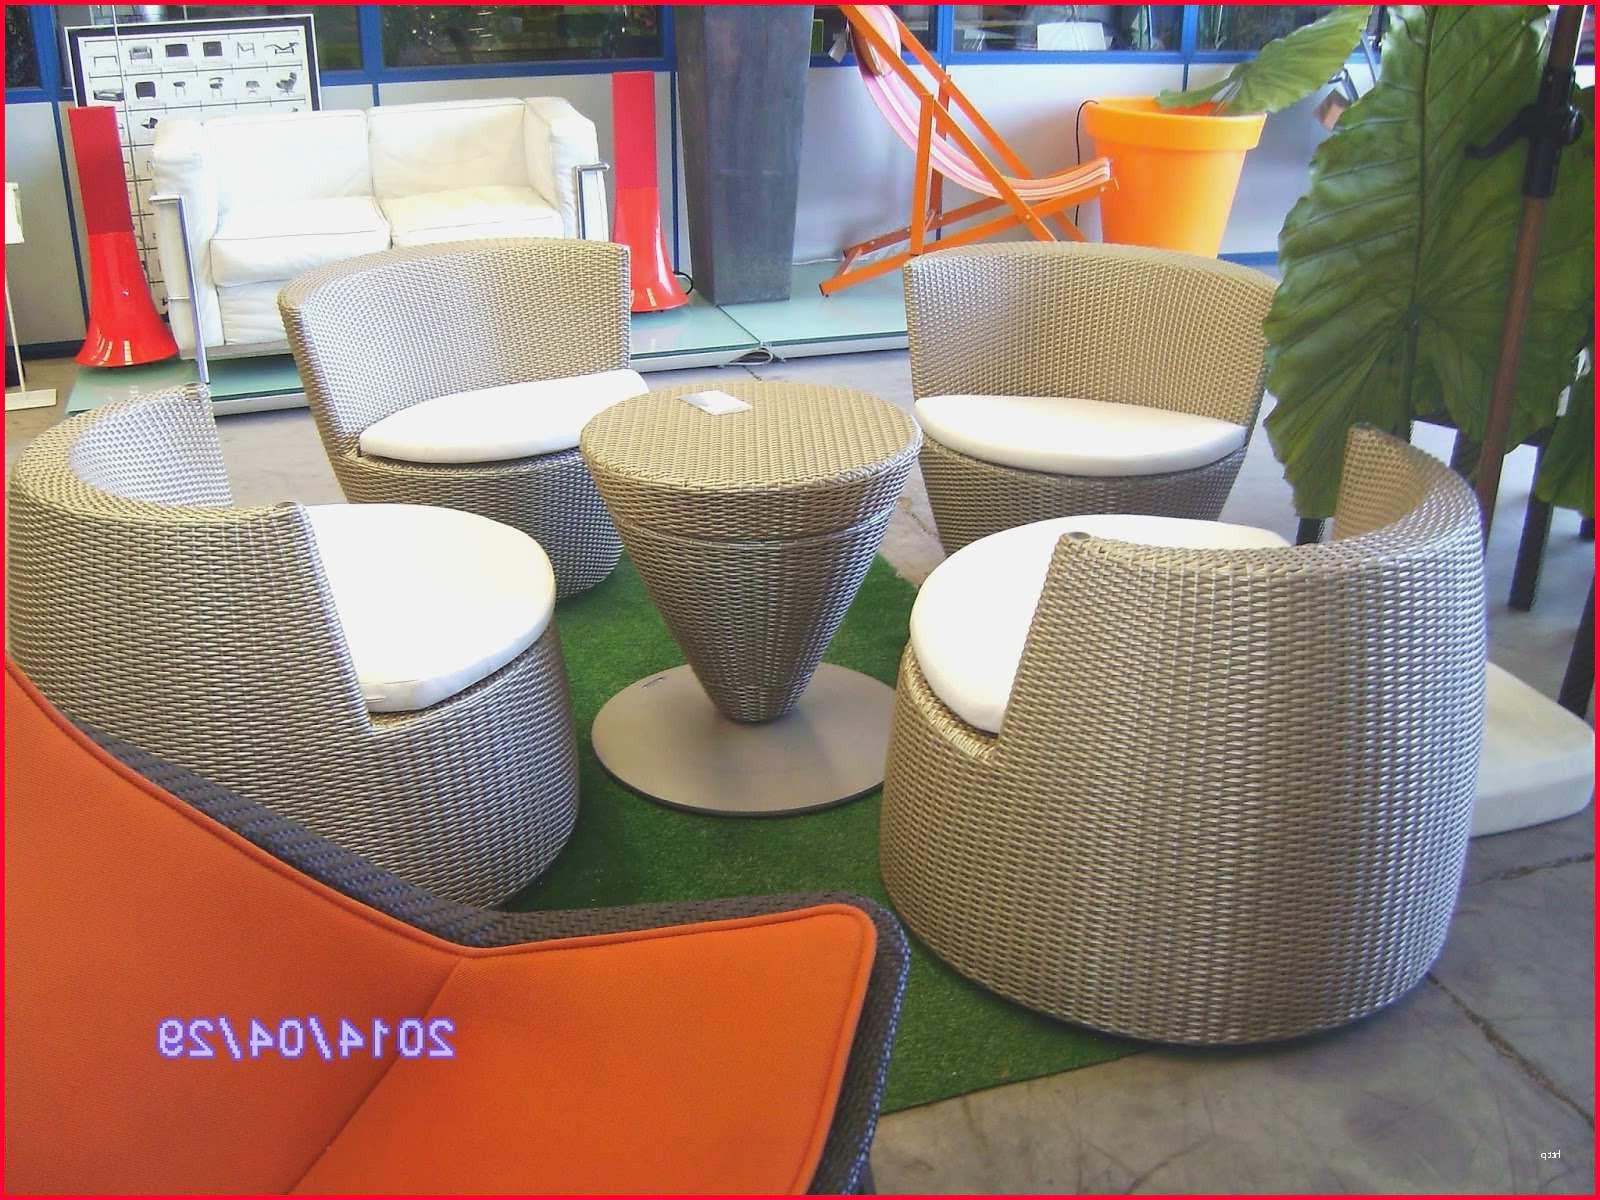 Muebles De Terraza Segunda Mano E6d5 Muebles Terraza Segunda Mano Las Cautivador Mobiliario Para